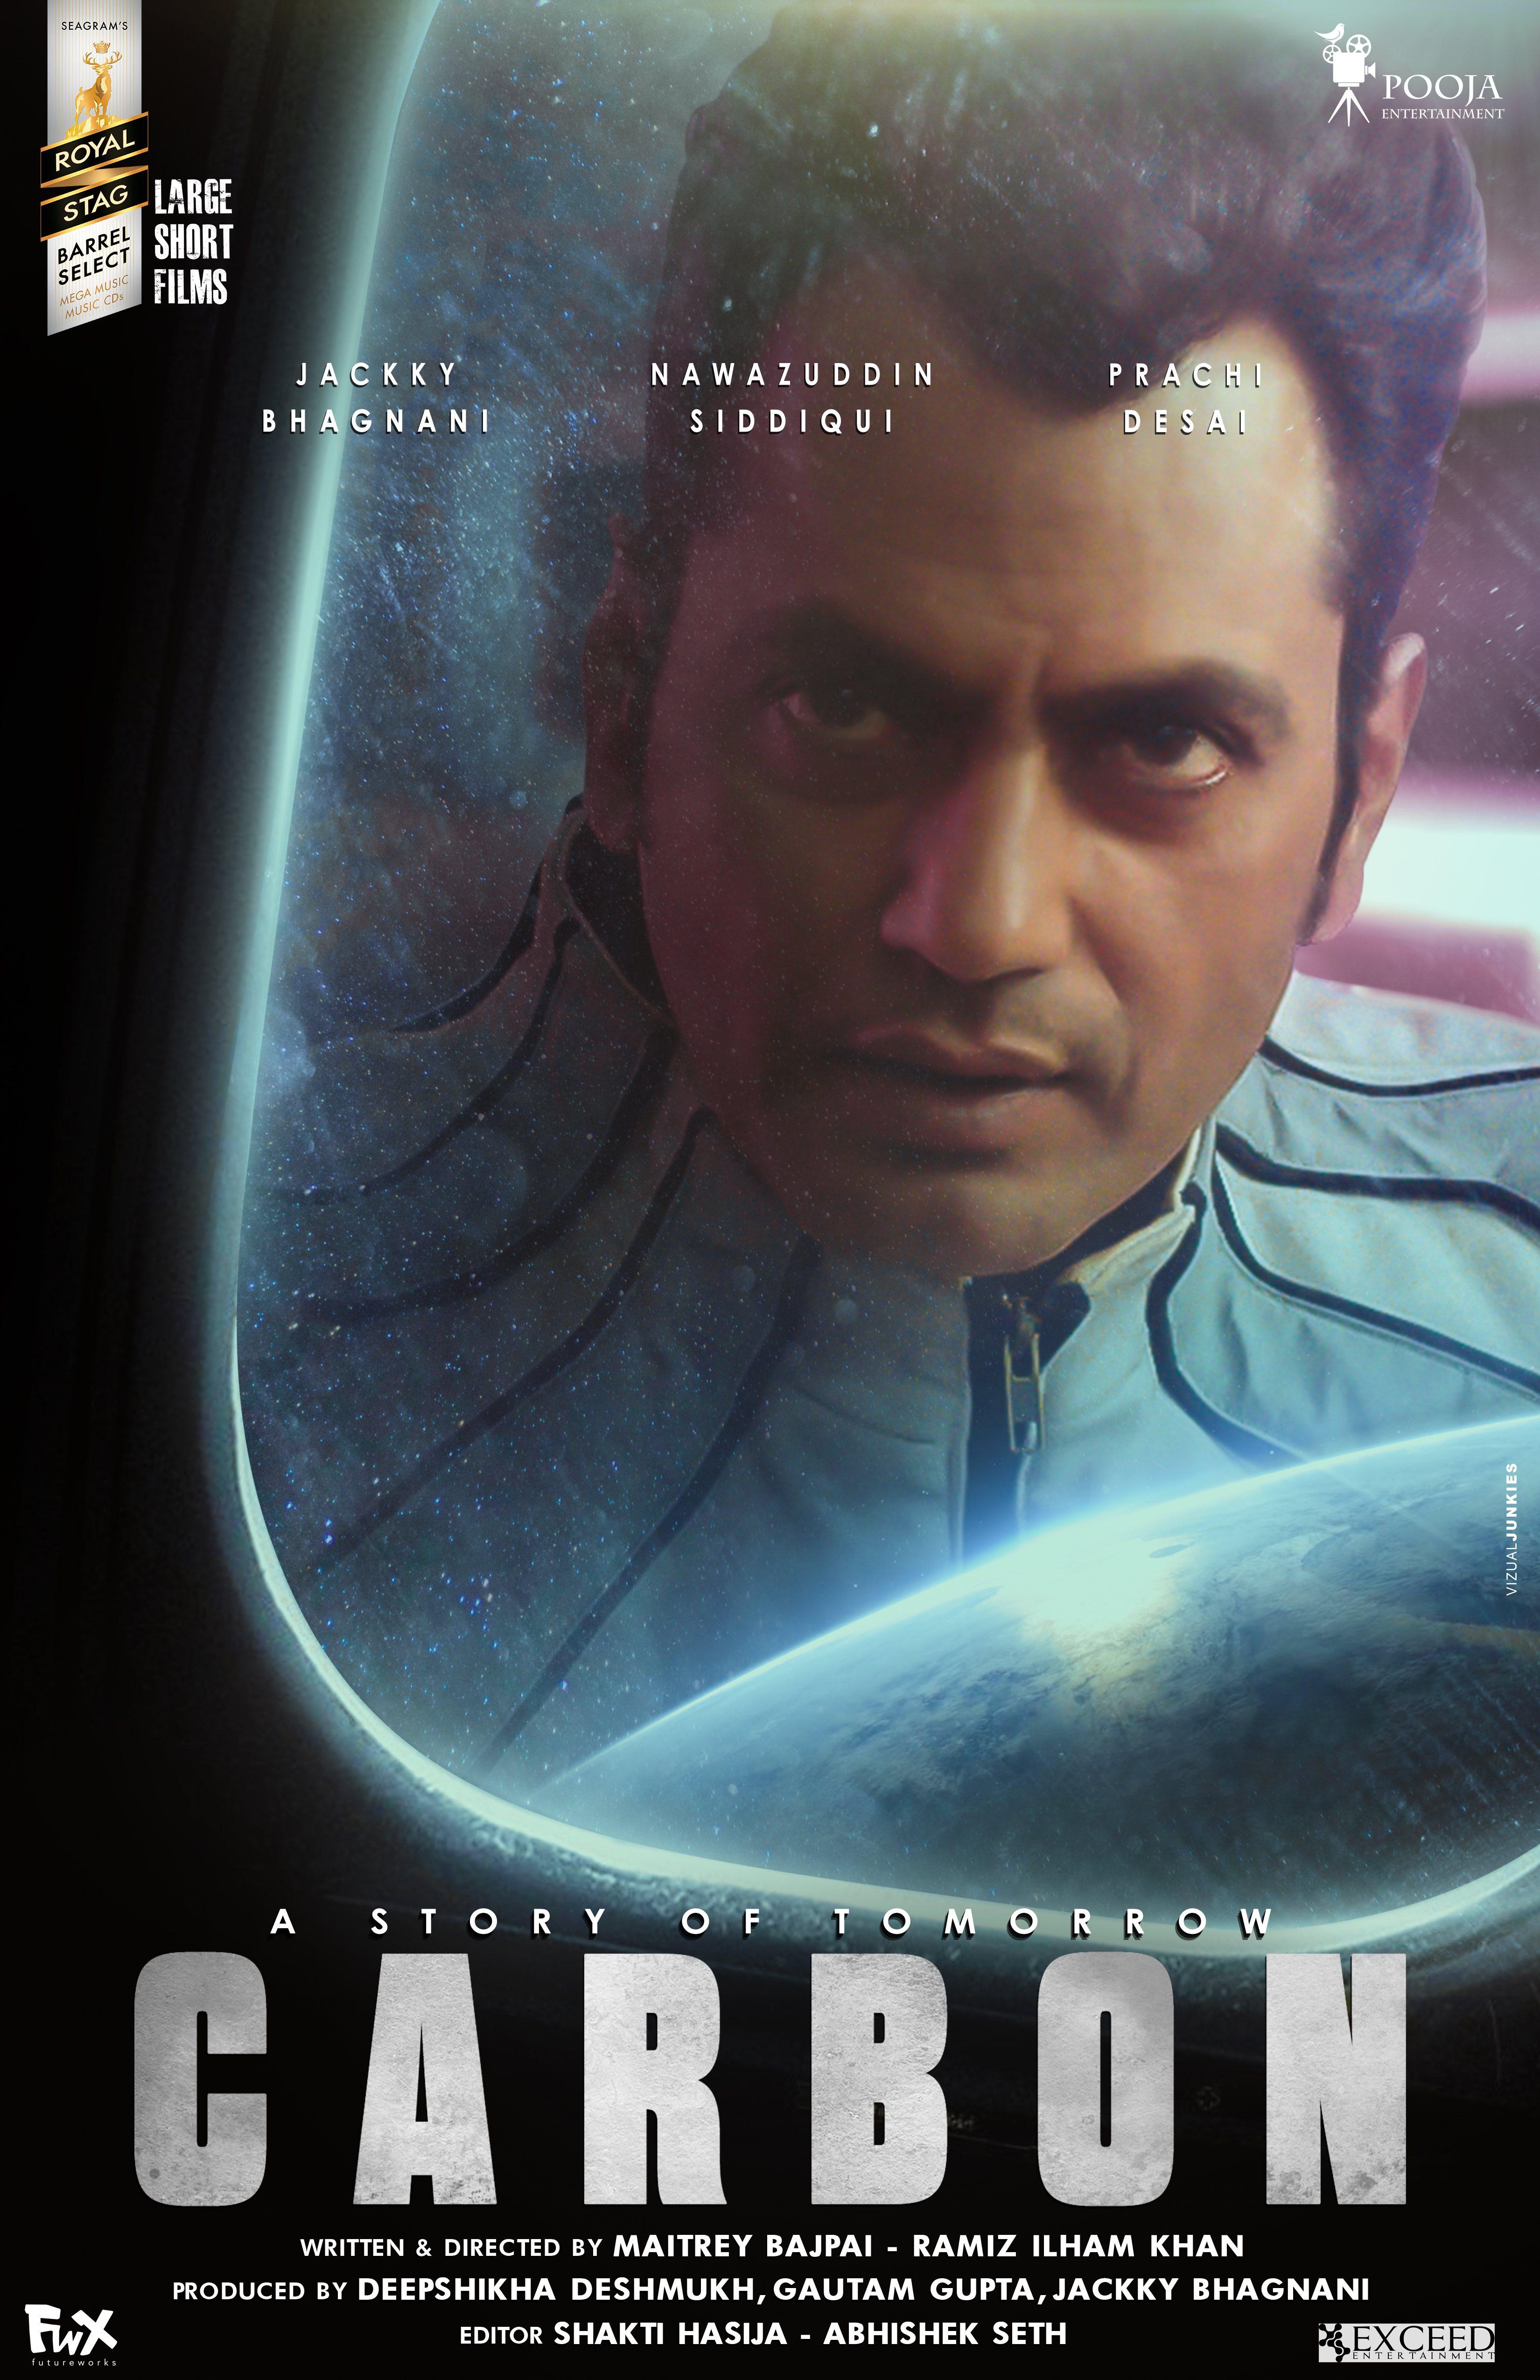 Short film 'Carbon' releases poster of Nawazuddin Siddiqui, Prachi Desai